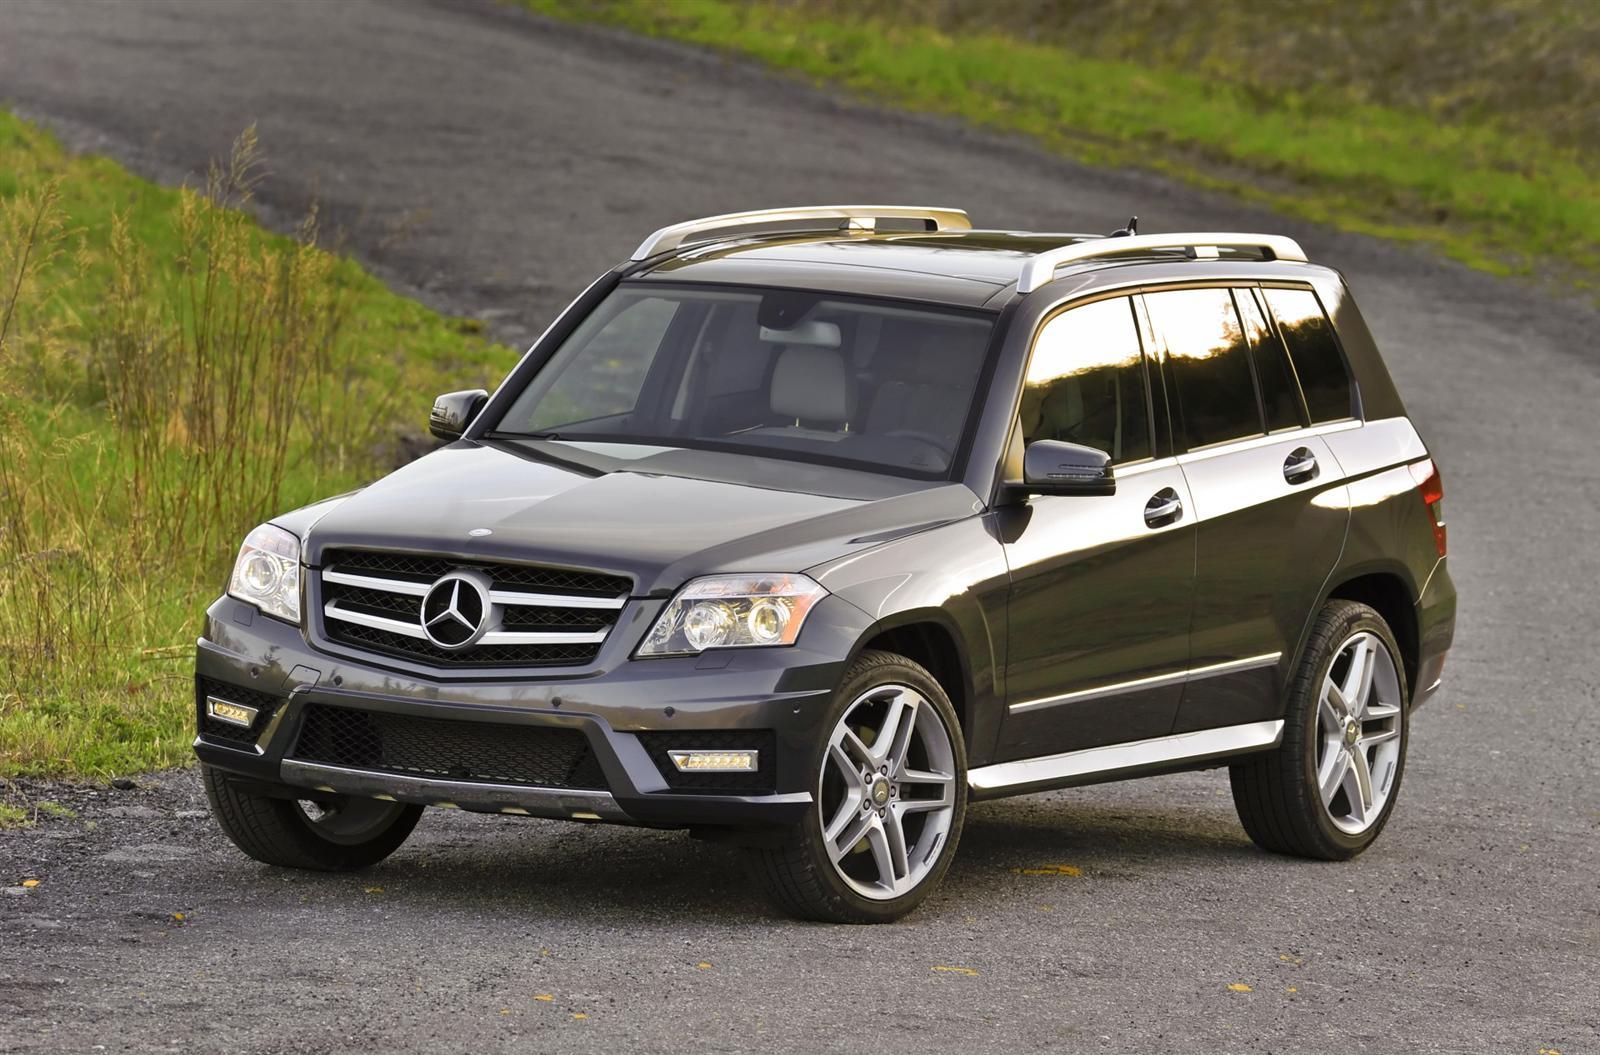 2011 Mercedes Benz Glk Class Image Photo 38 Of 45